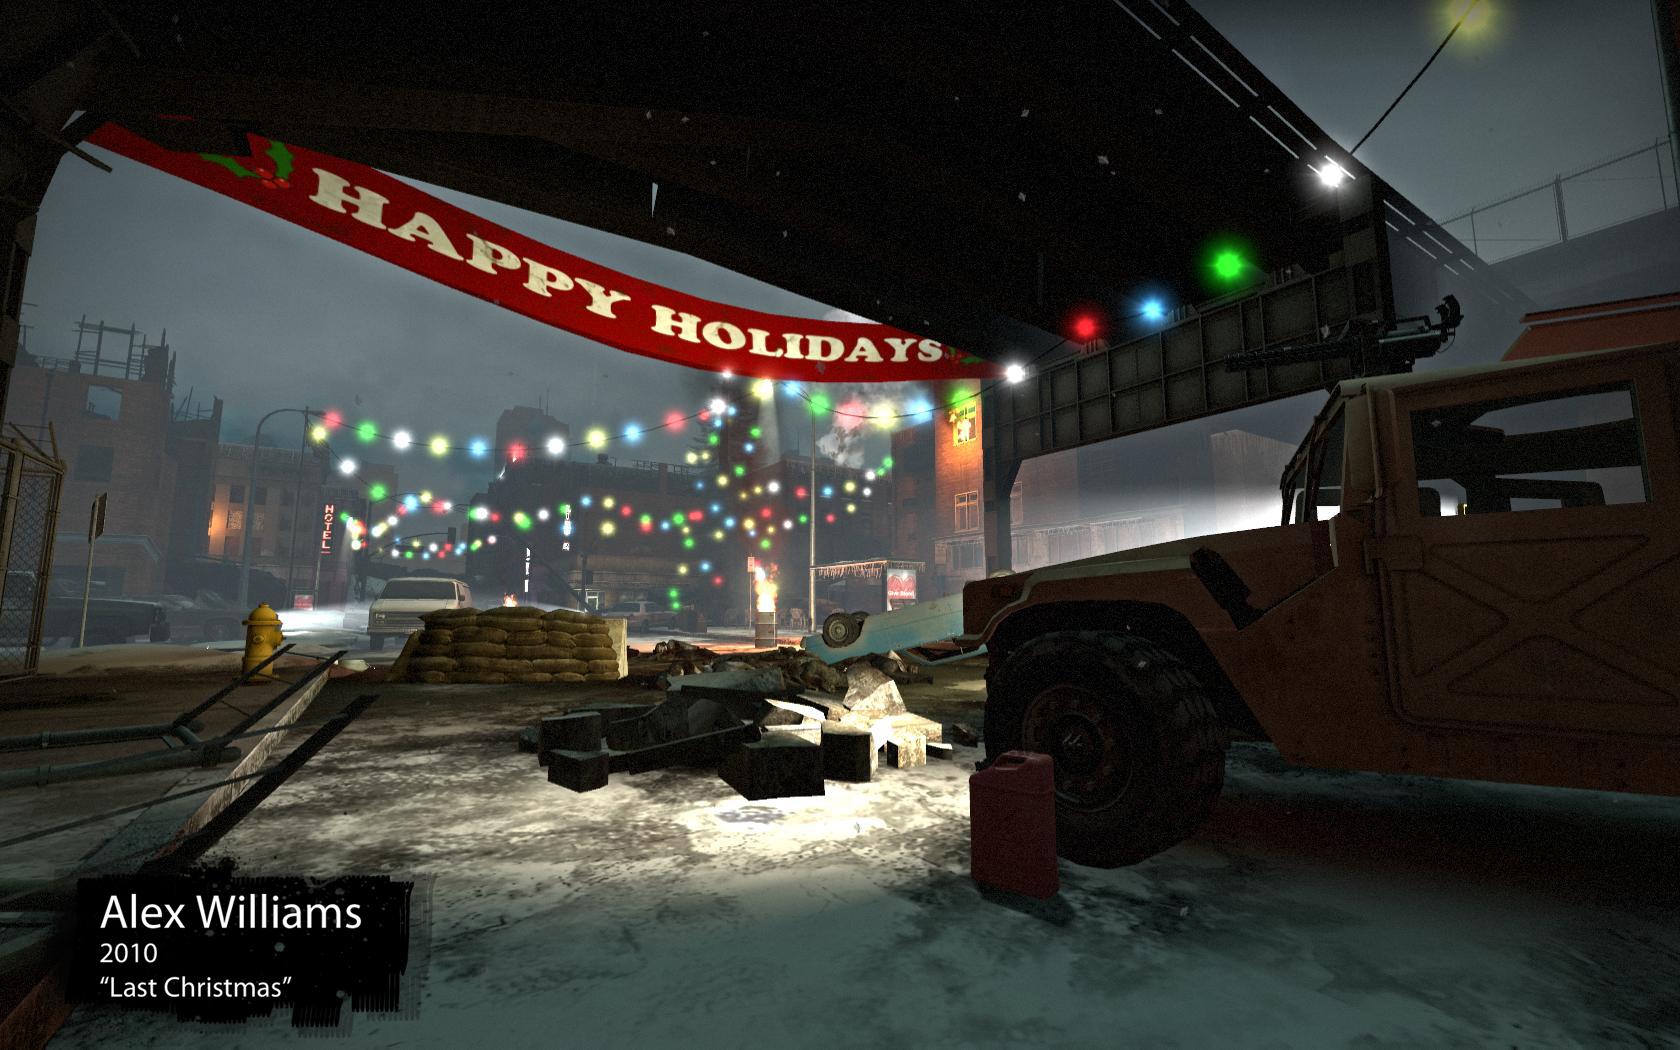 last christmas view original - Last Christmas Original